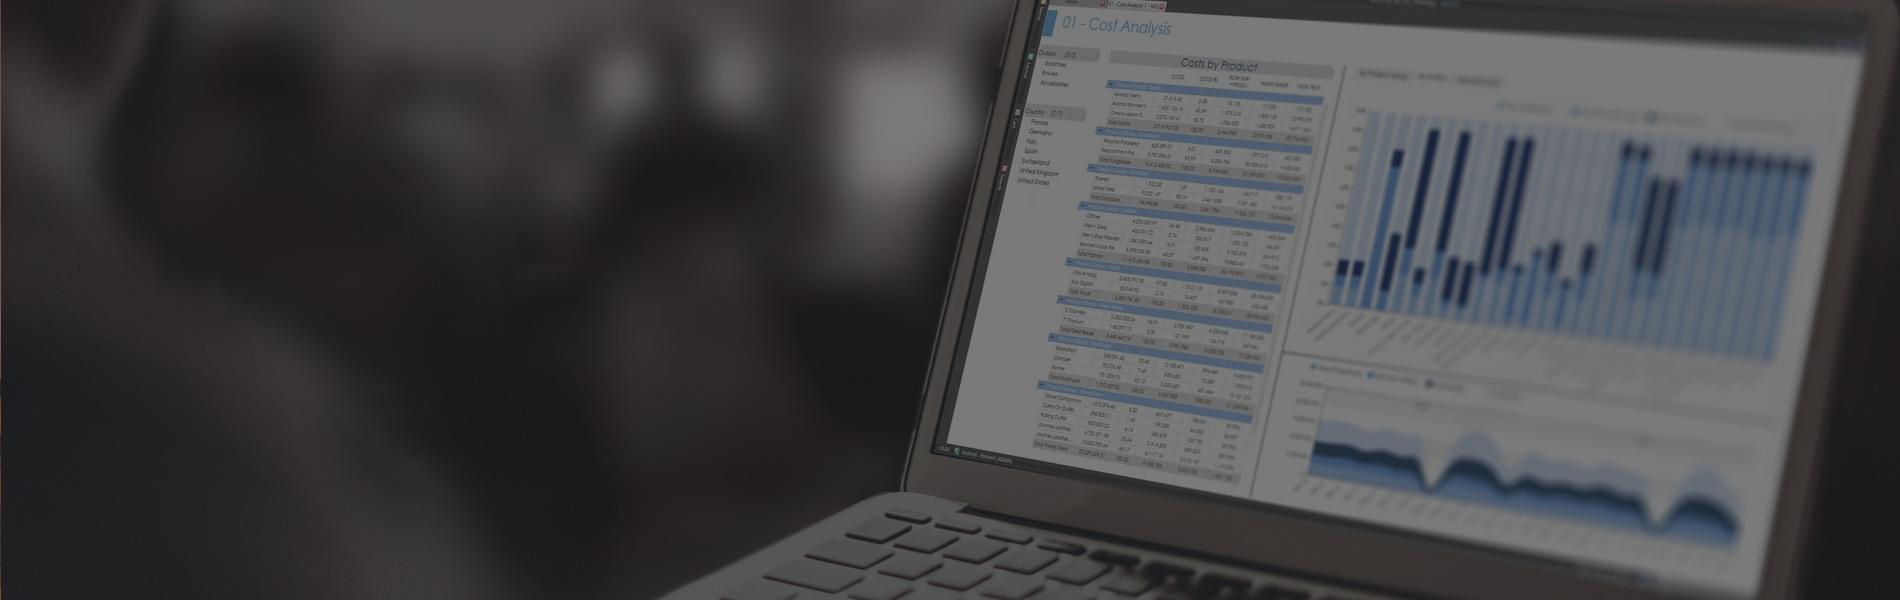 BOARD MIT Software Consultancy